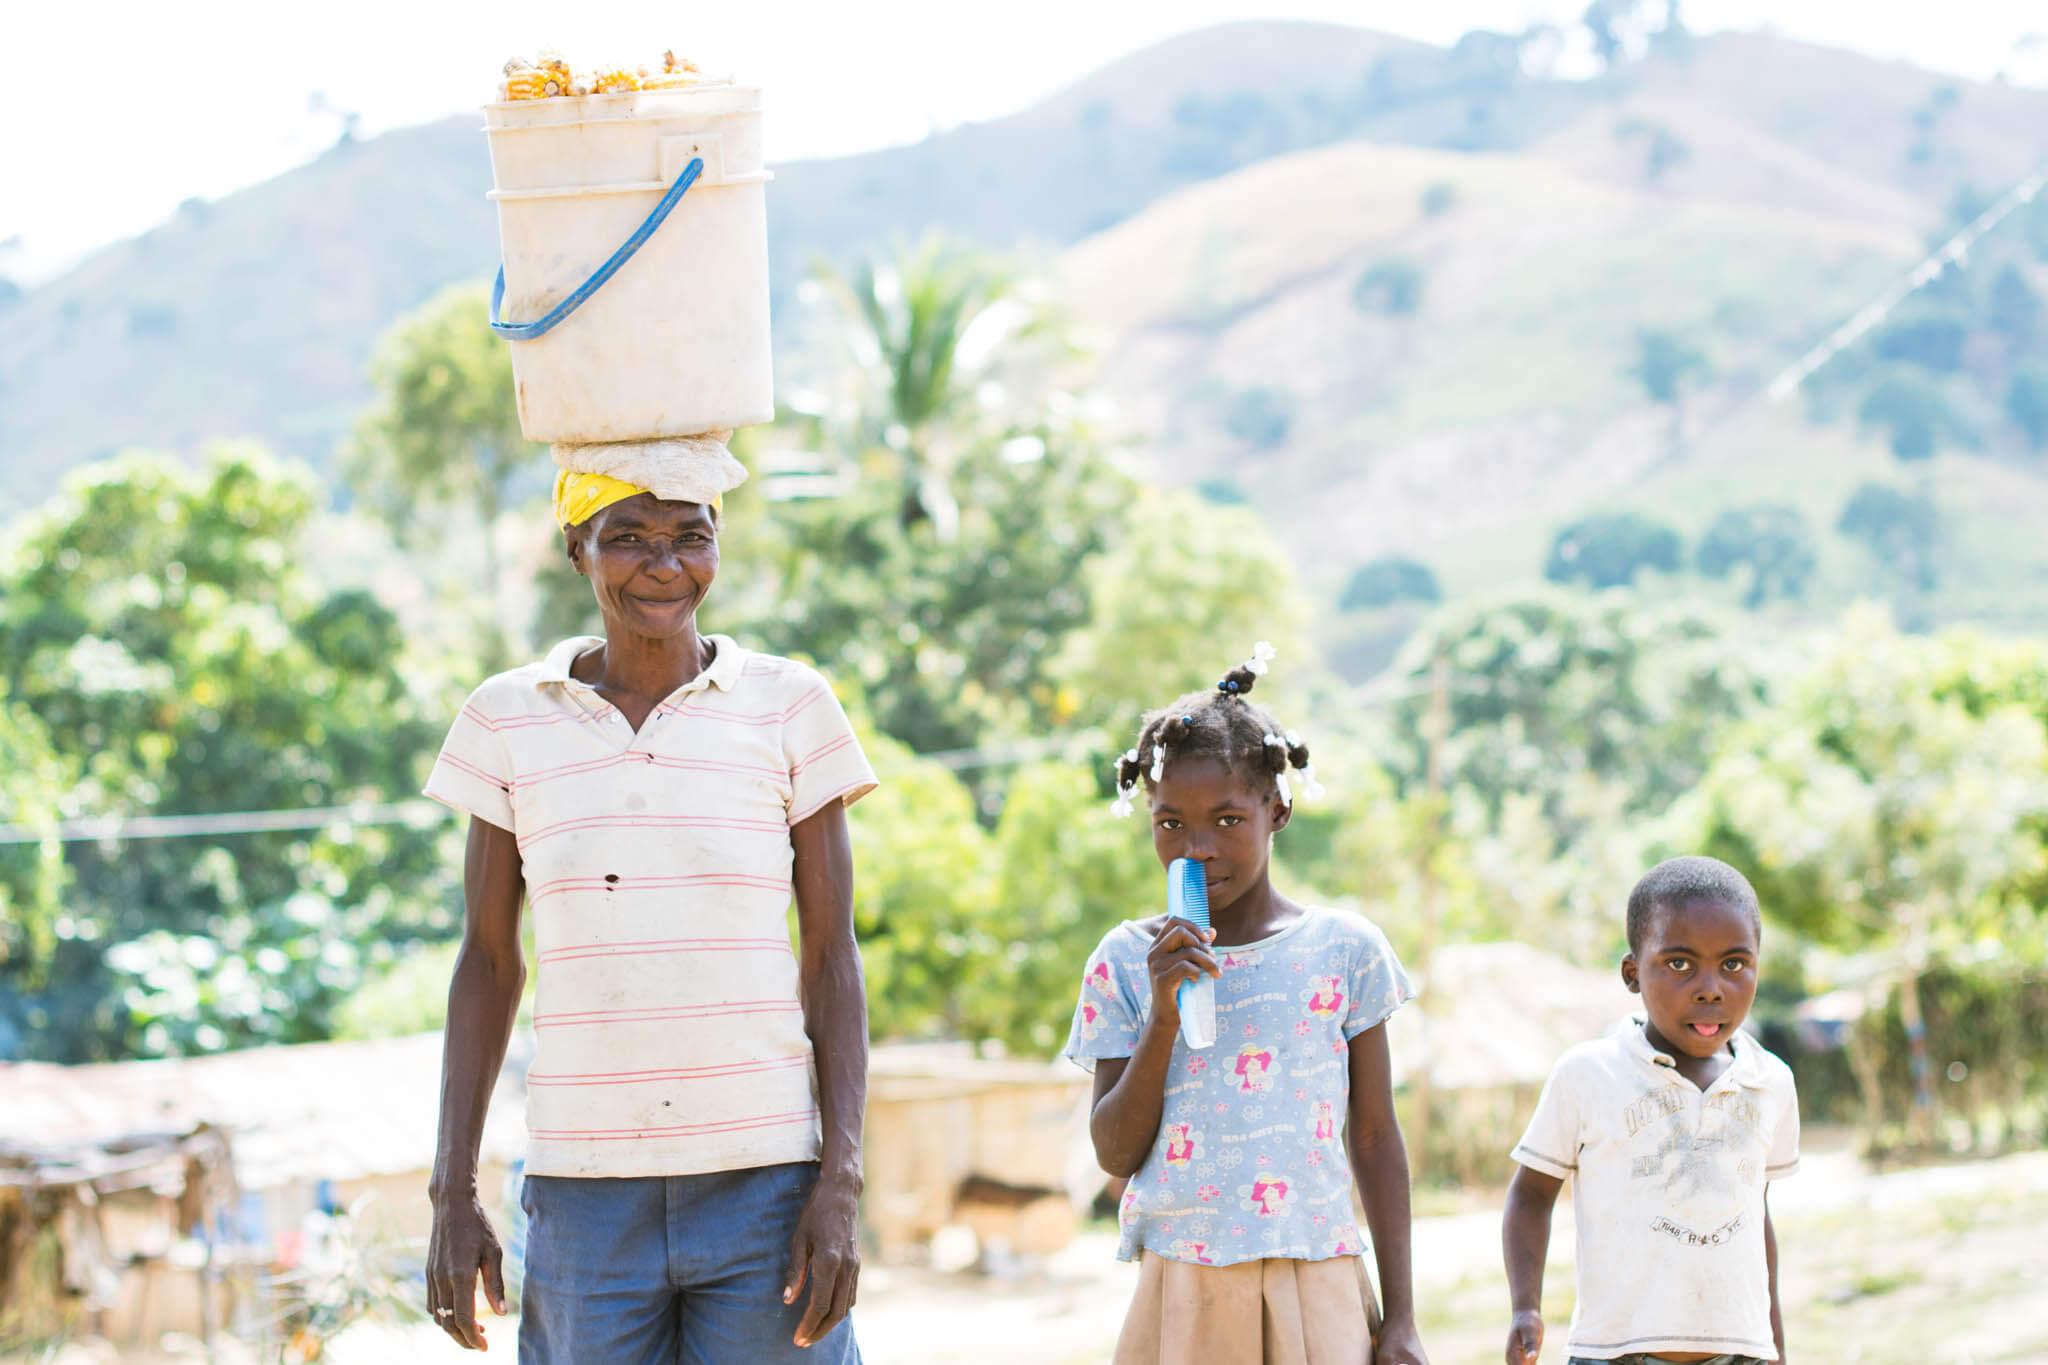 Understanding-the- Impact-of-$10-in Bois-de-Laurence,-Haiti.jpg